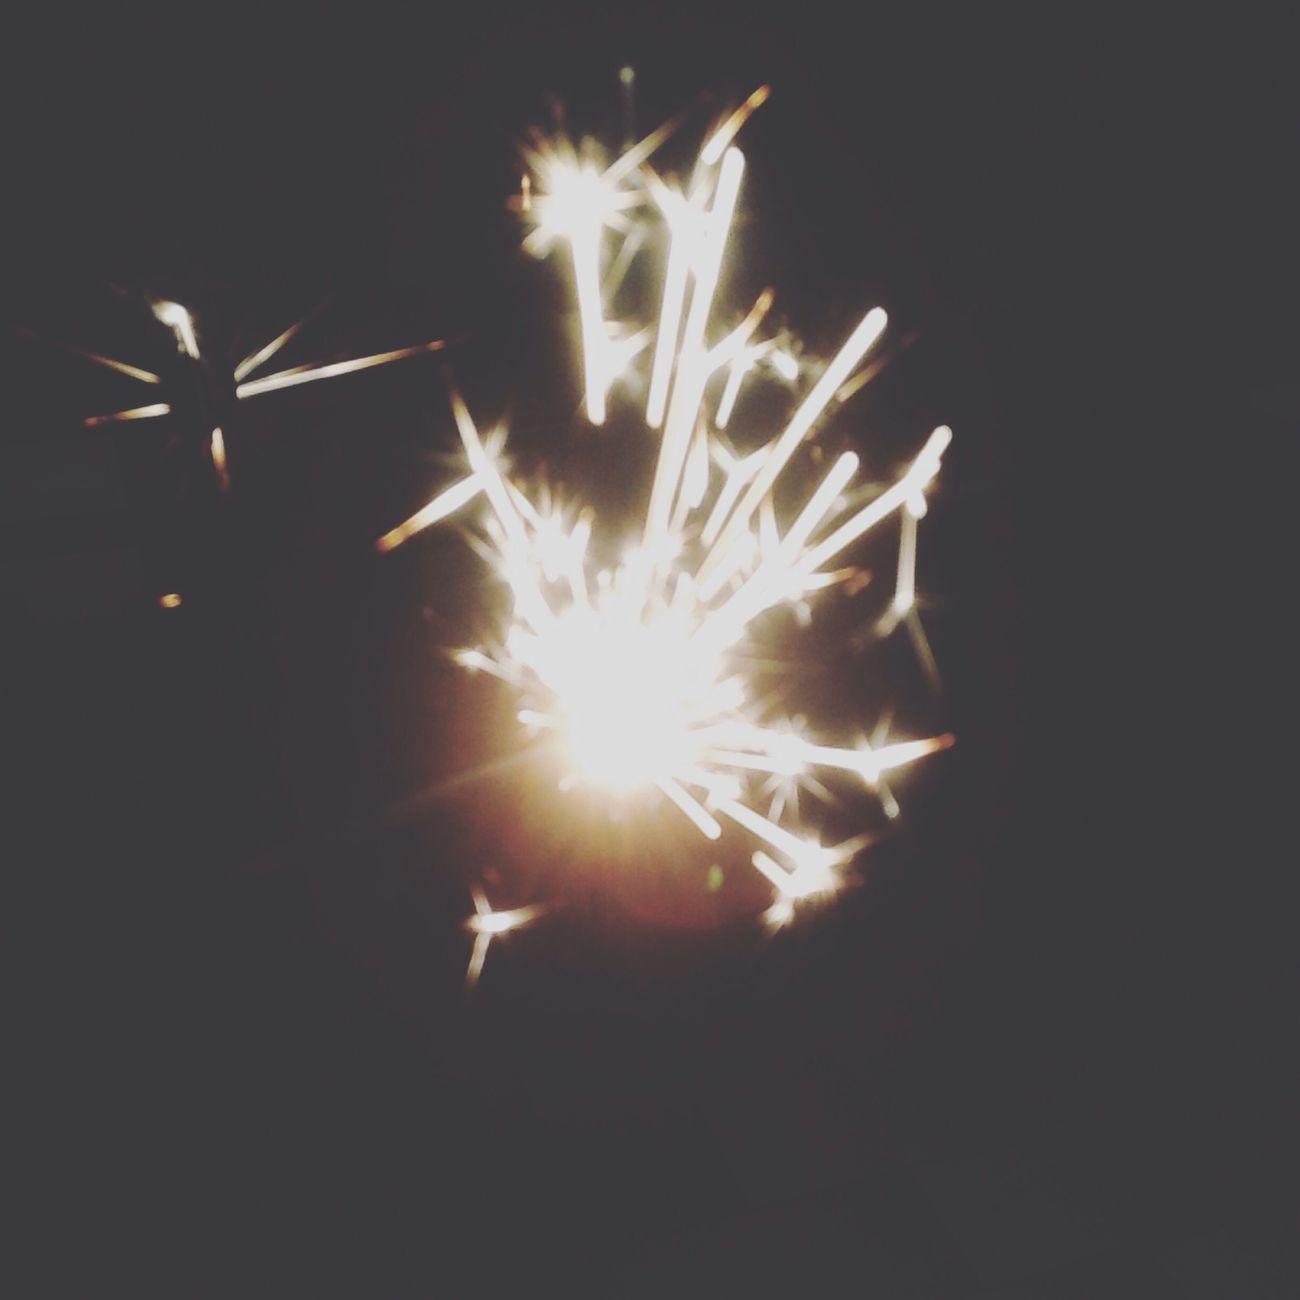 Celebration Sparkler Sparks Motion Night Firework Display No People Burning Outdoors Firework - Man Made Object